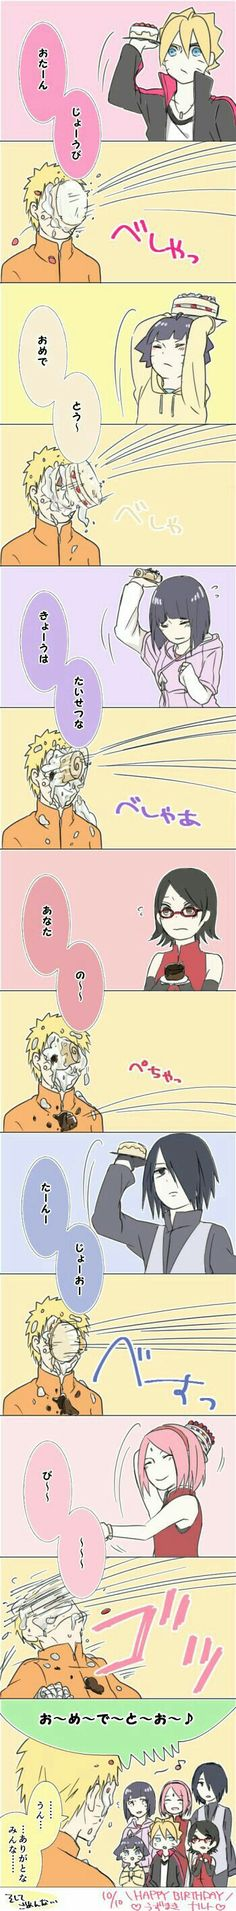 Happy Birthday Naruto, Boruto, Himawari, Hinata, Sasuke, Sakura, Sarada, Uzumaki family, Uchiha family, funny, text, comic, cake; Naruto